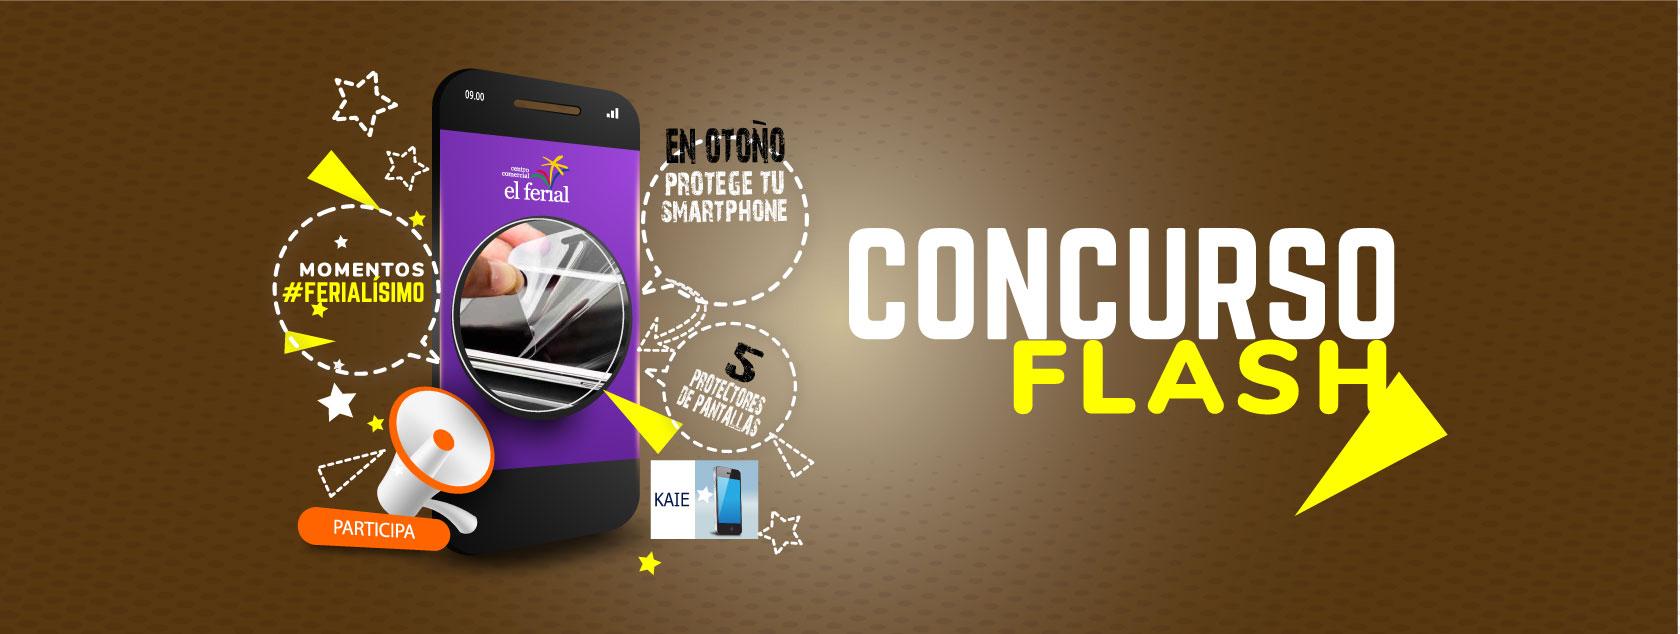 Concurso Flash. Regalamos 5 protectores de pantalla